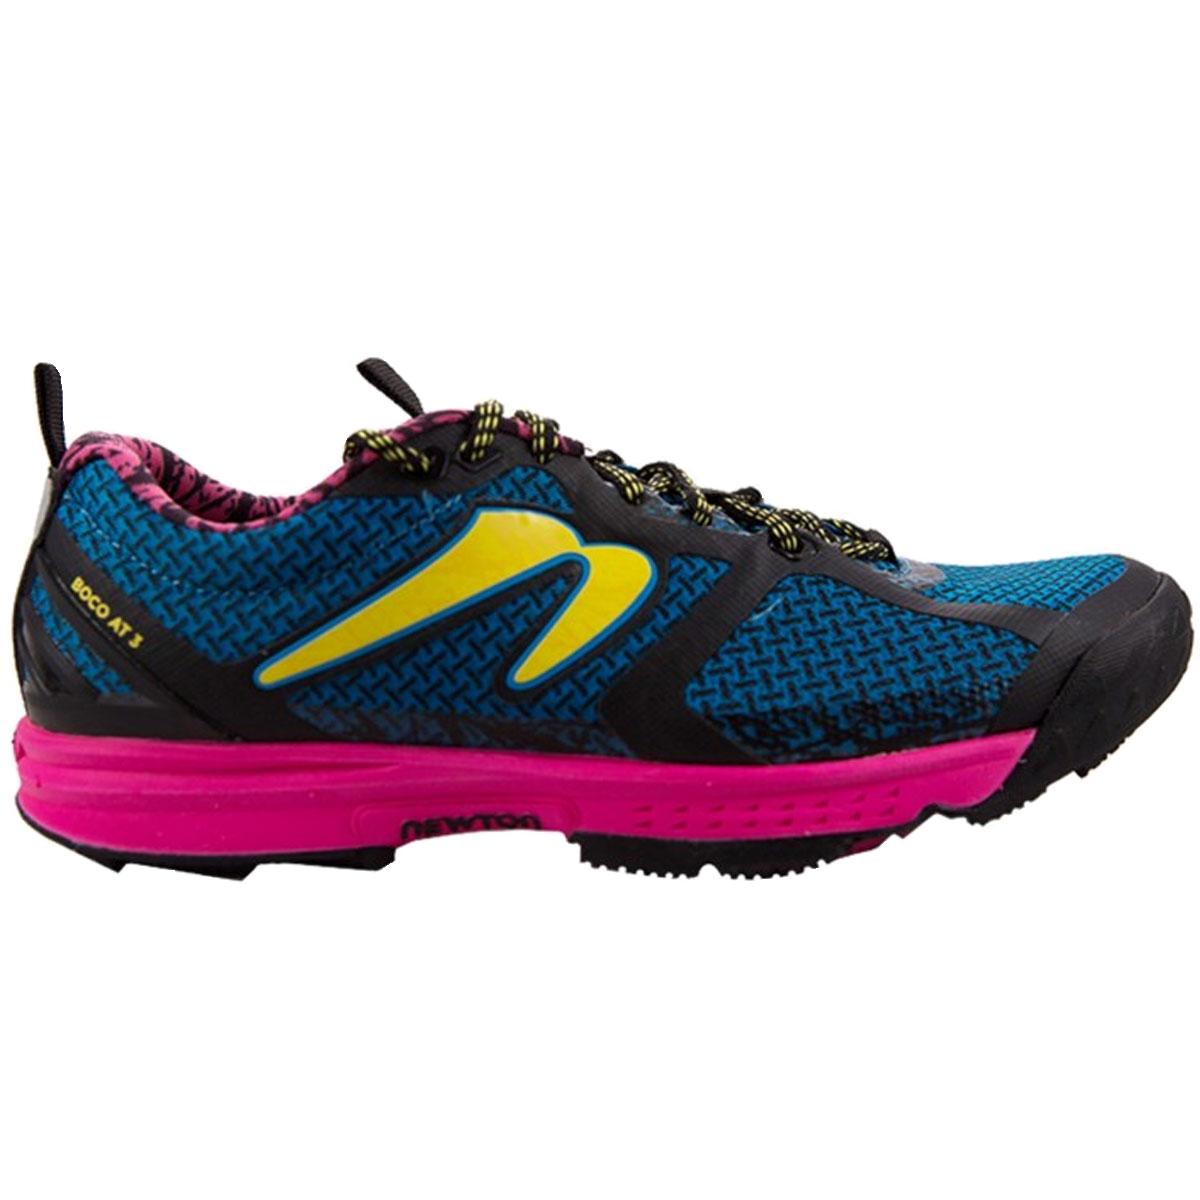 Boco Schuhe Laufschuhe Sportschuhe Newton At 3 Trail n8wOP0k